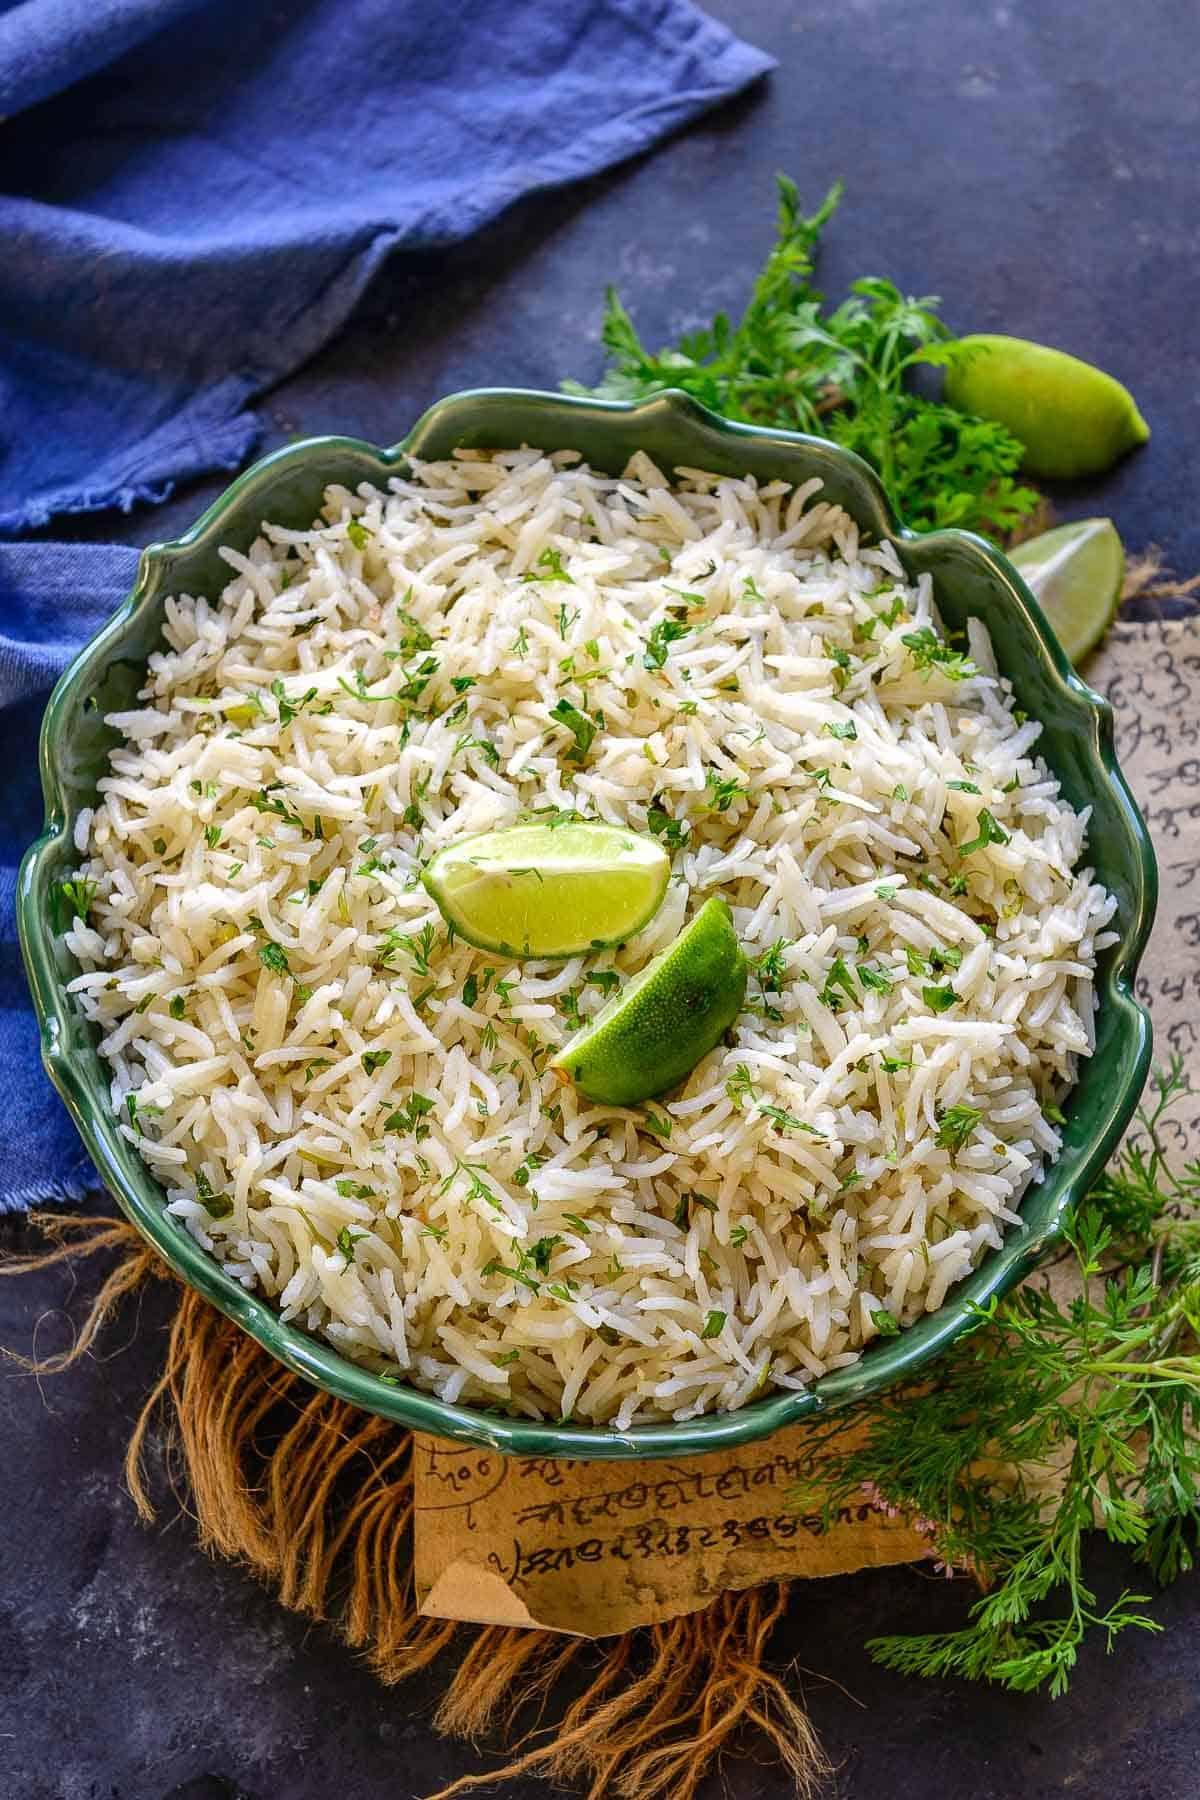 Lemon cilantro rice served in a bowl.